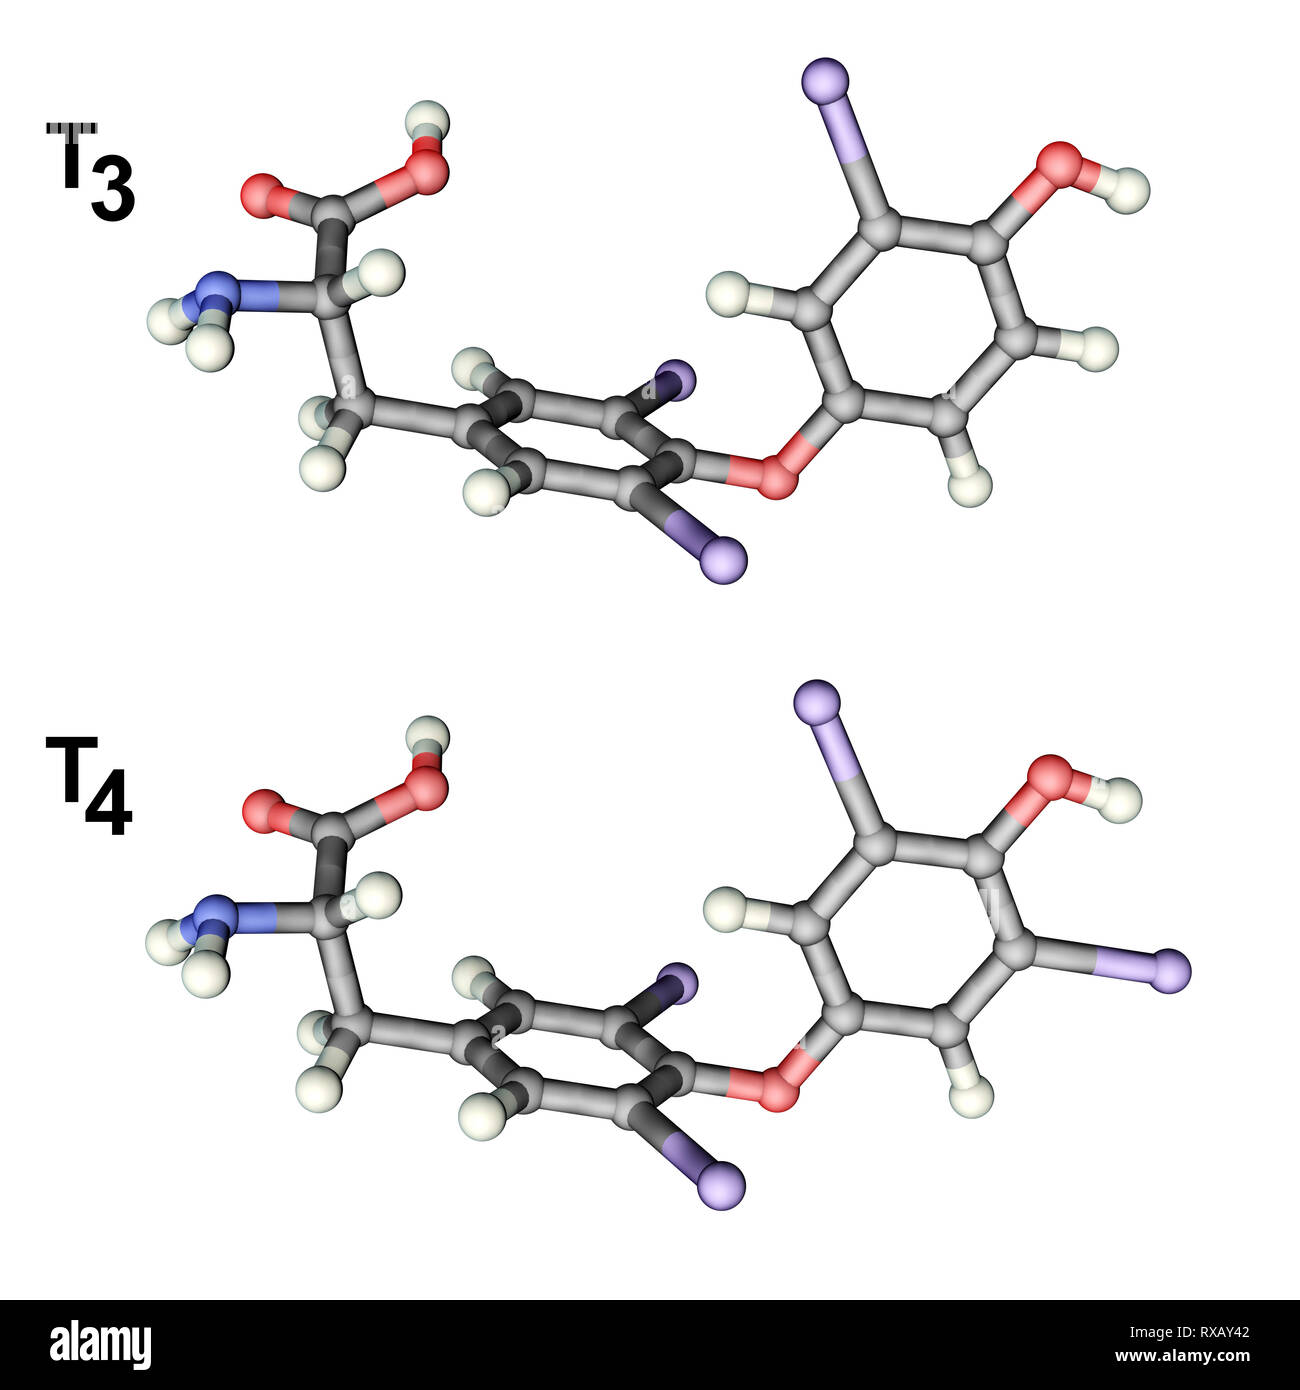 Triiodothyronine and thyroxine hormone, molecular models Stock Photo